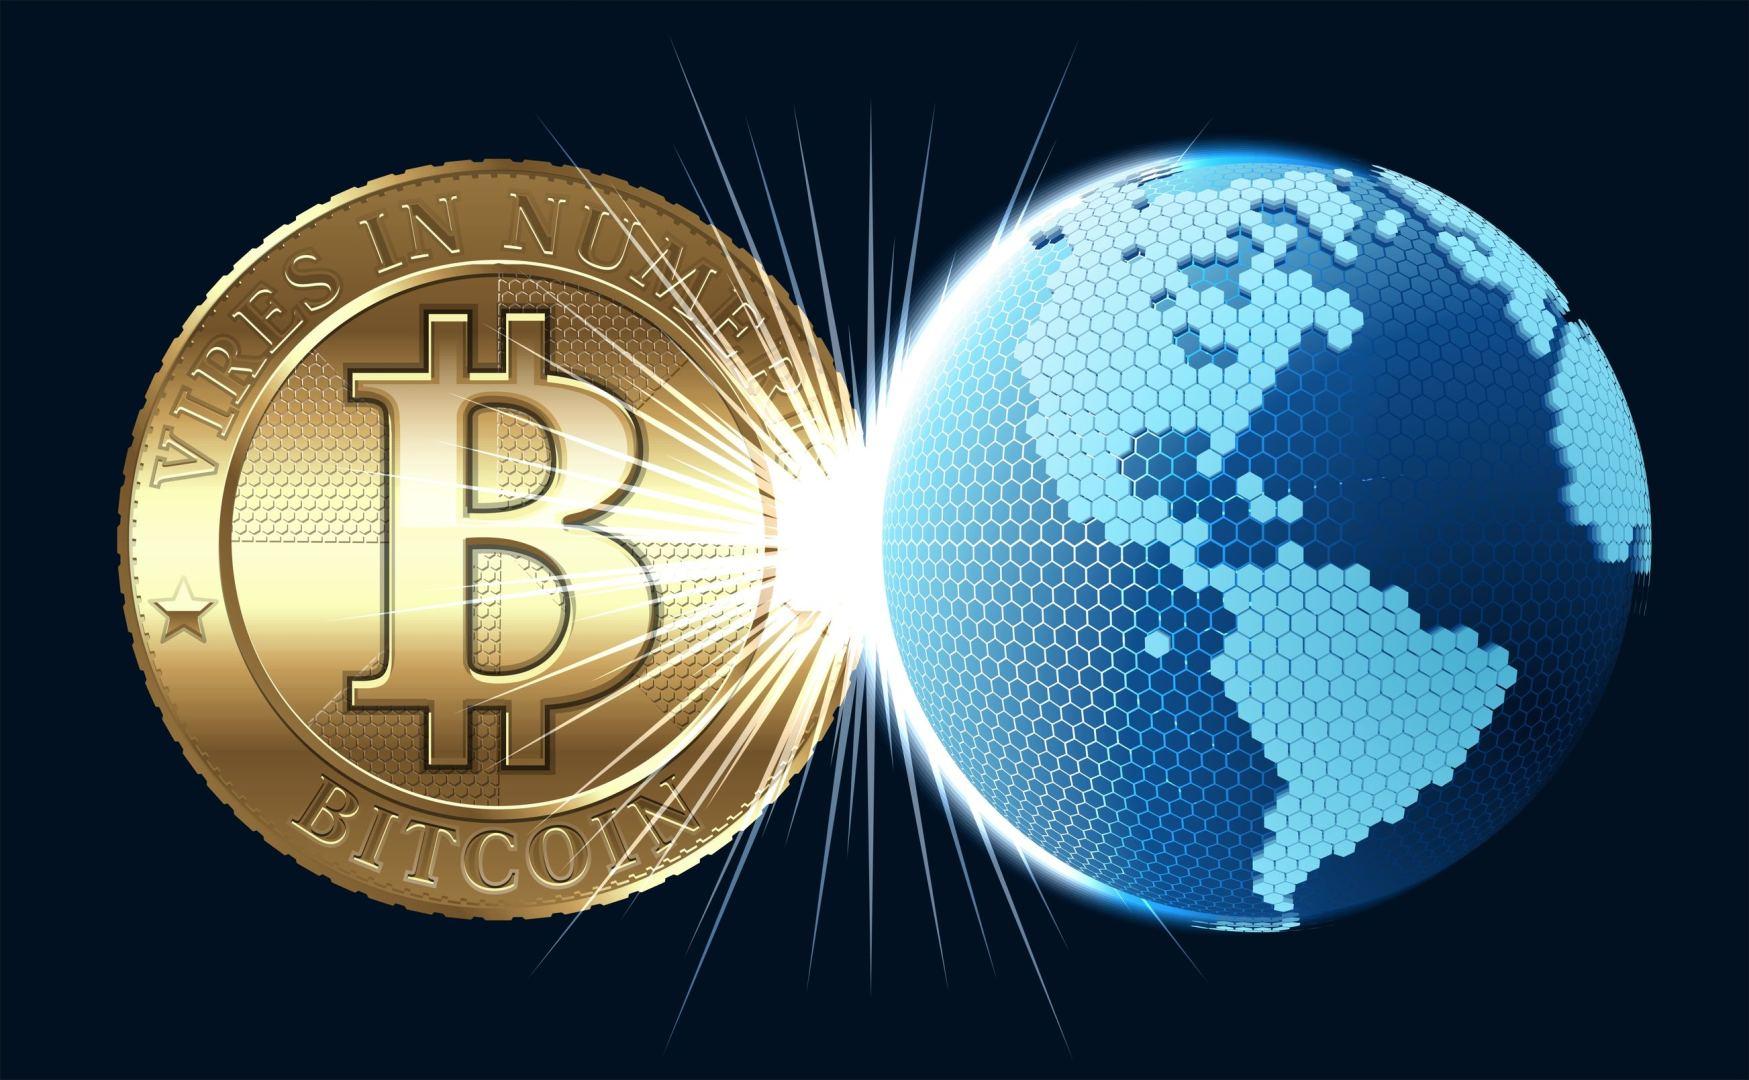 kaip atsiranda nauji bitkoinai